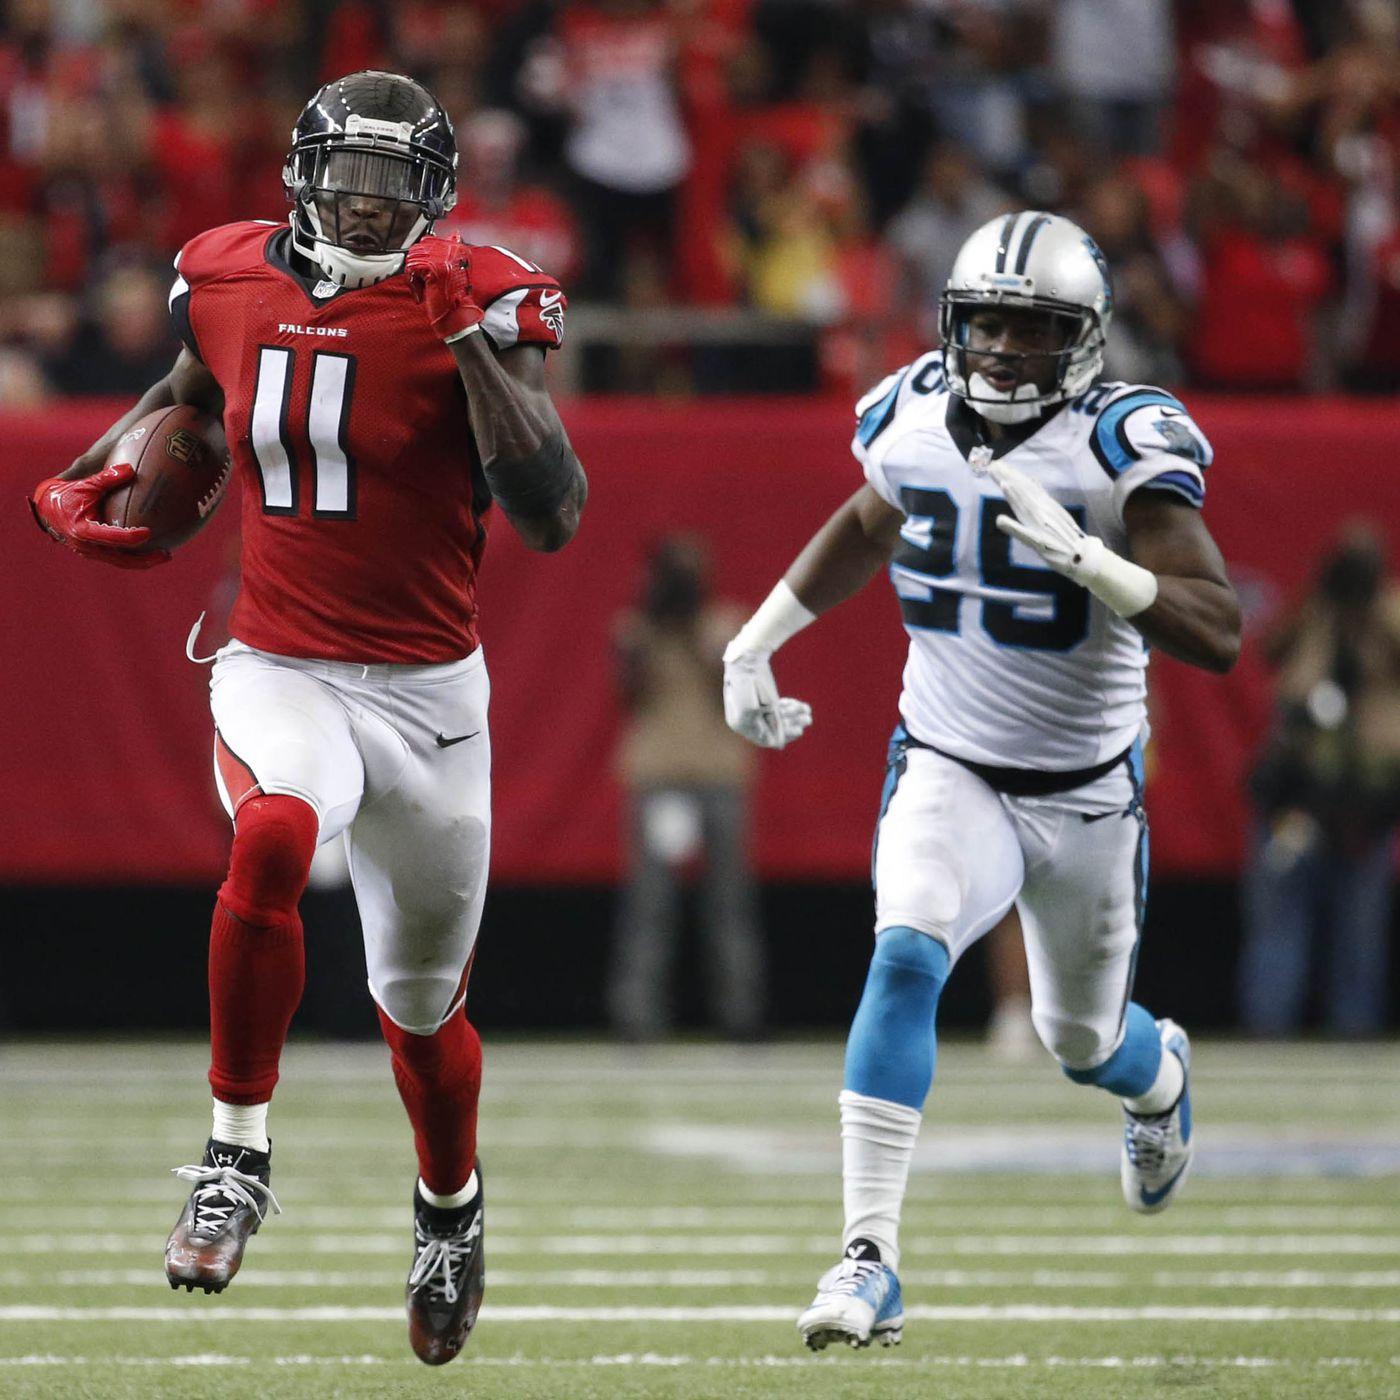 Panthers Cut Starting Cornerback Less Than A Week After Julio Jones Racked Up 300 Yards Sbnation Com